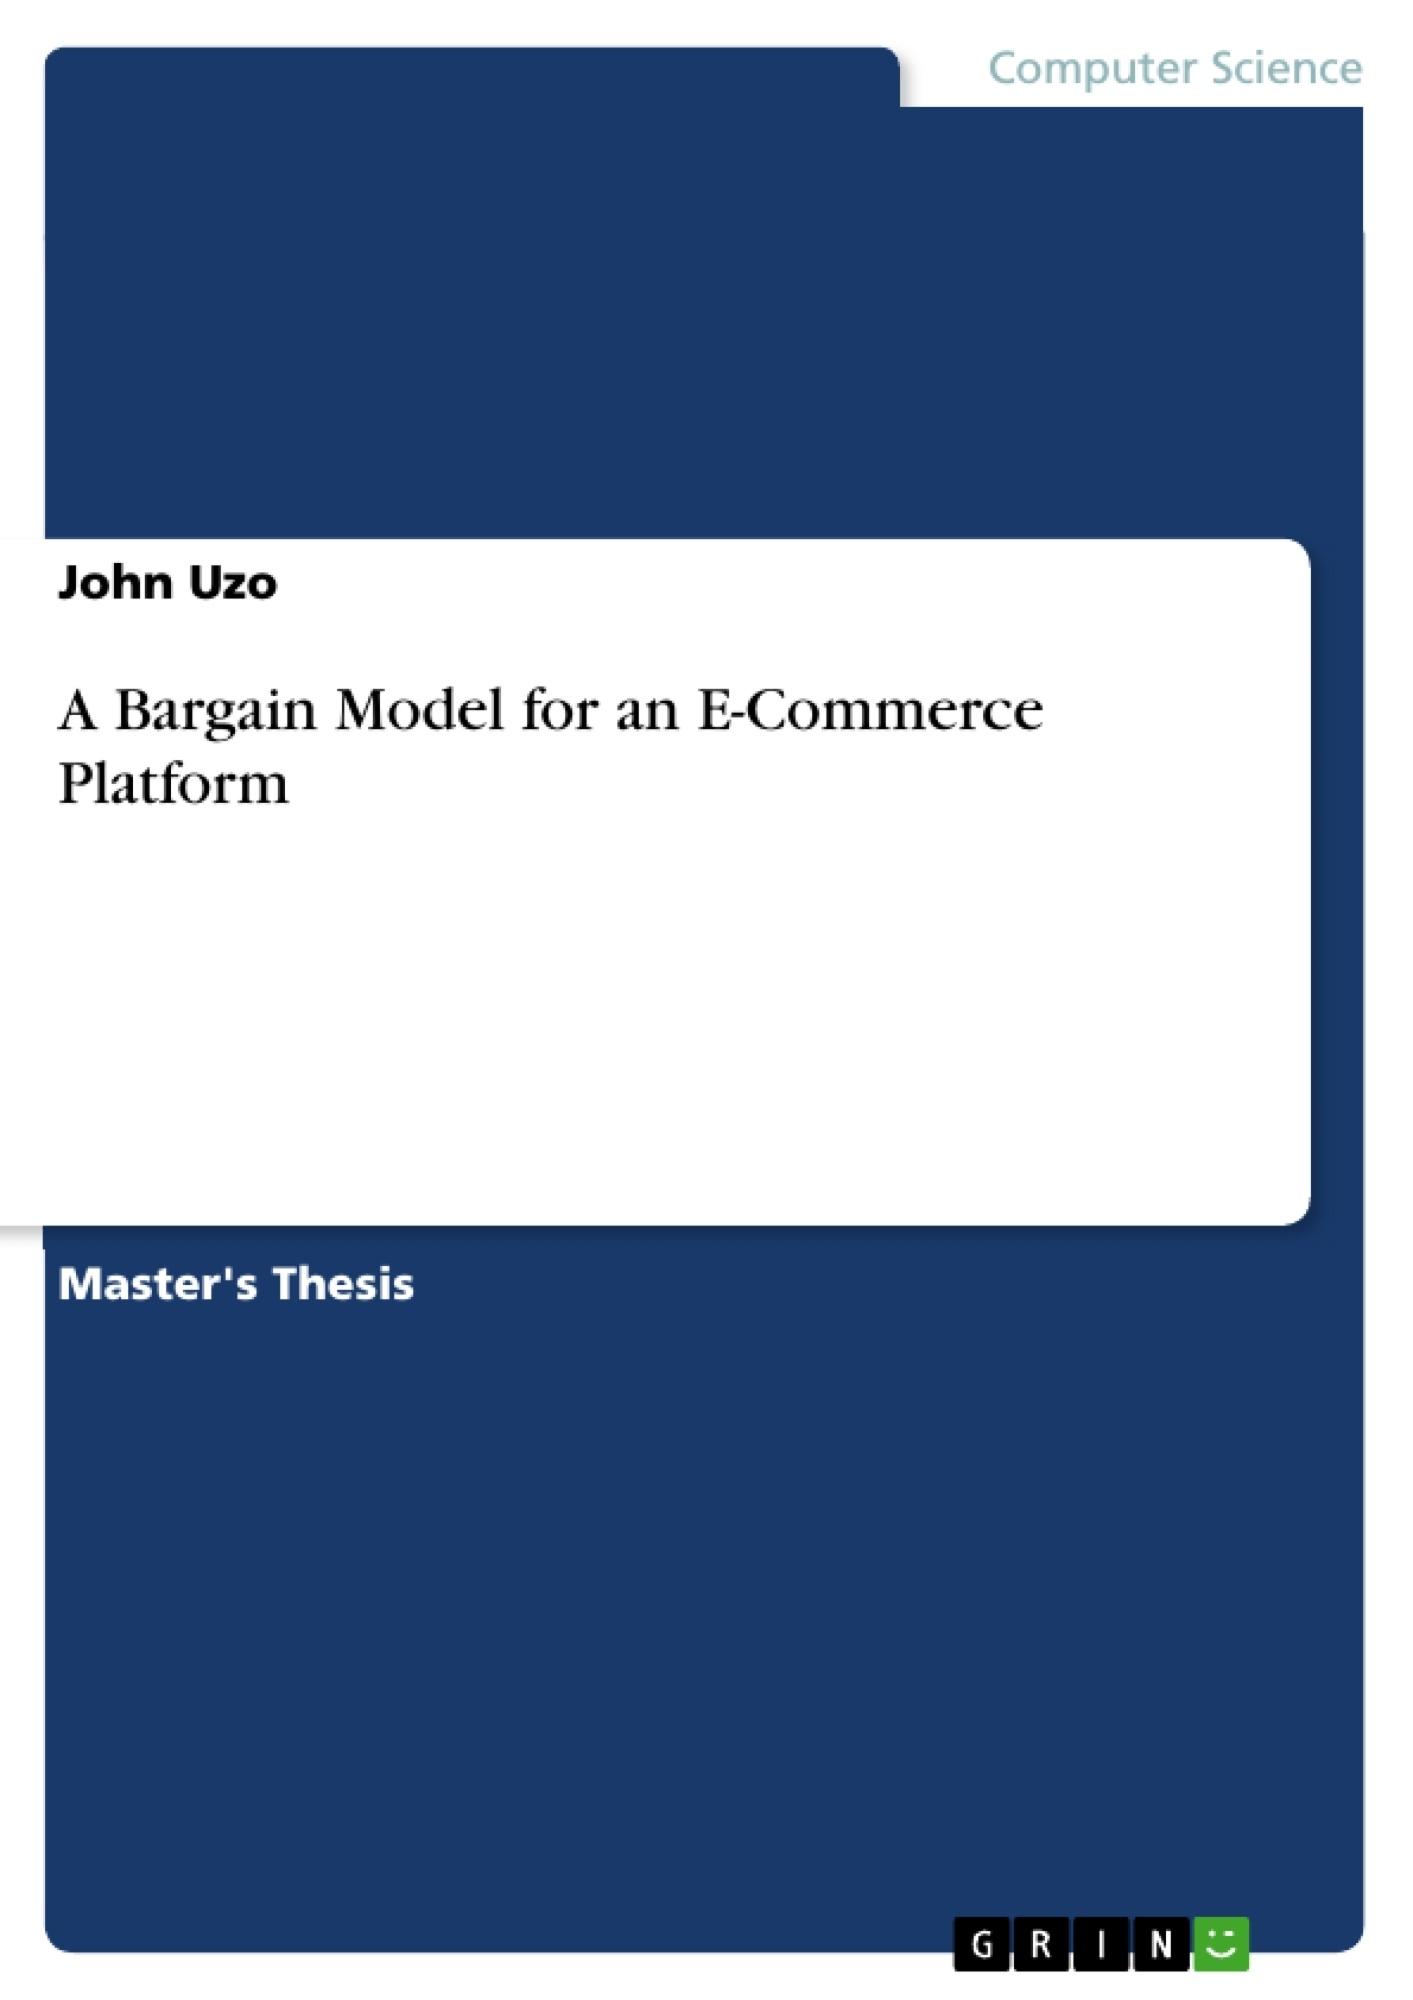 Title: A Bargain Model for an E-Commerce Platform